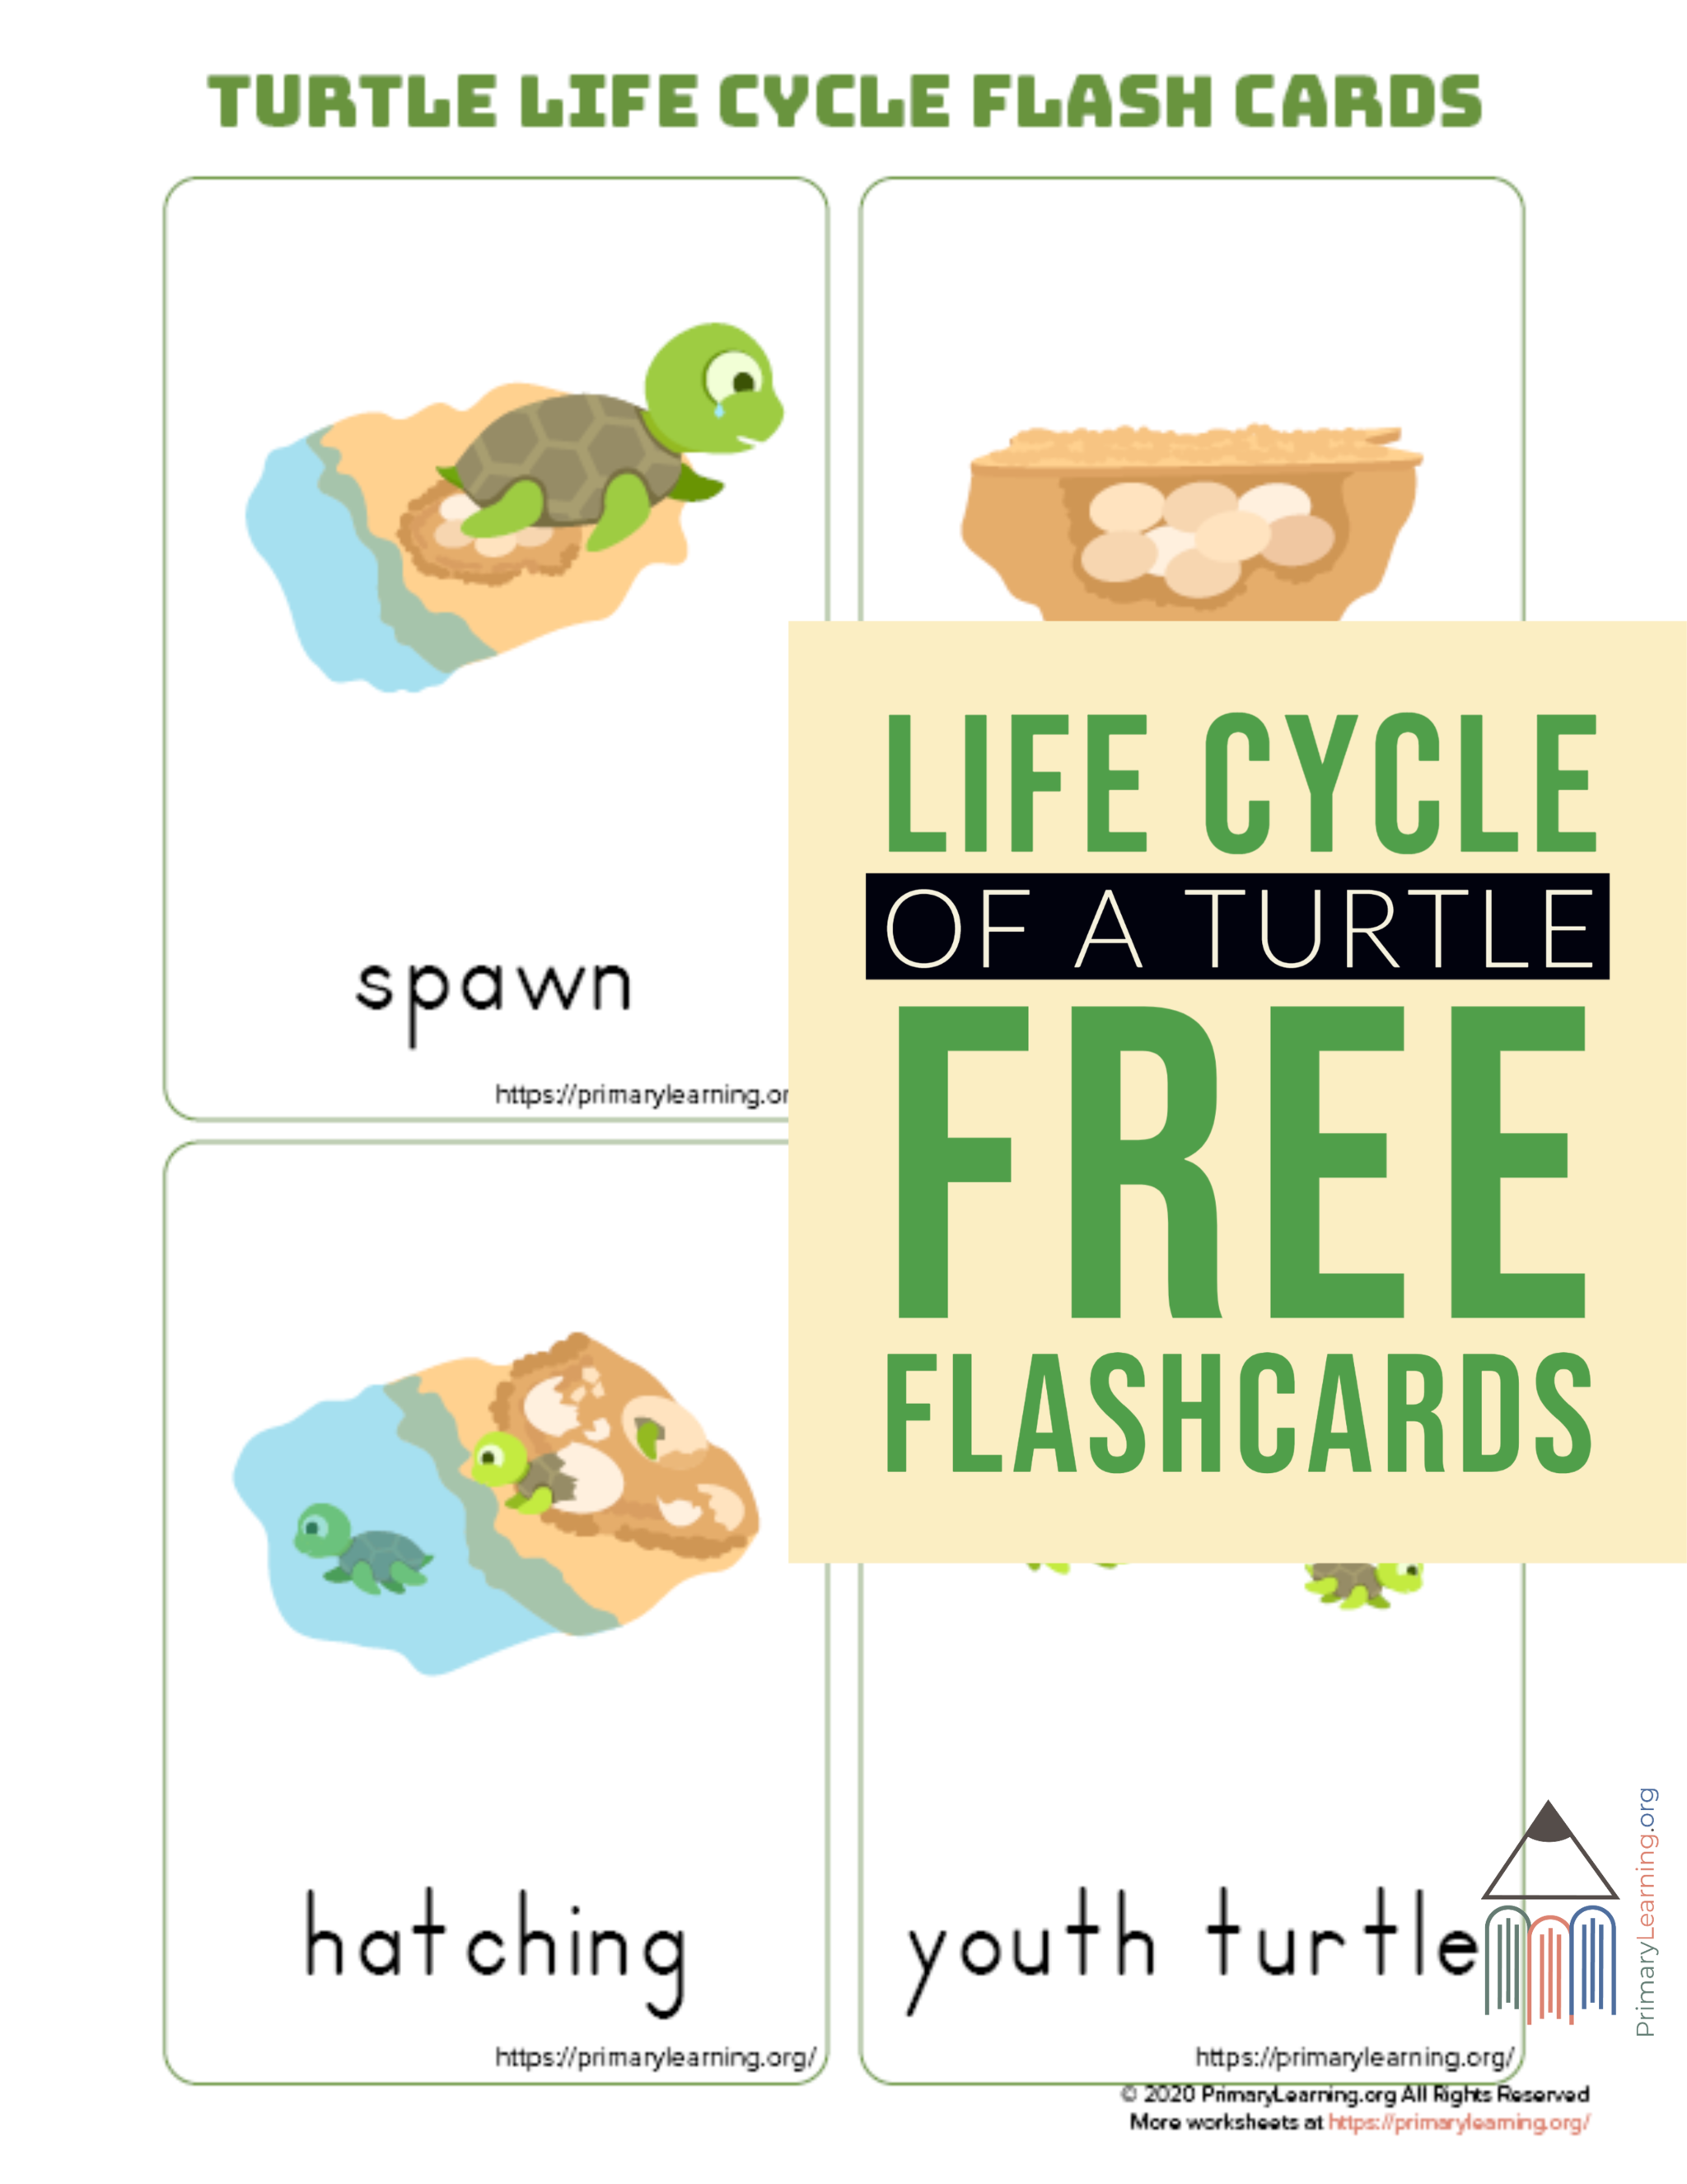 Turtle Life Cycle Flashcards